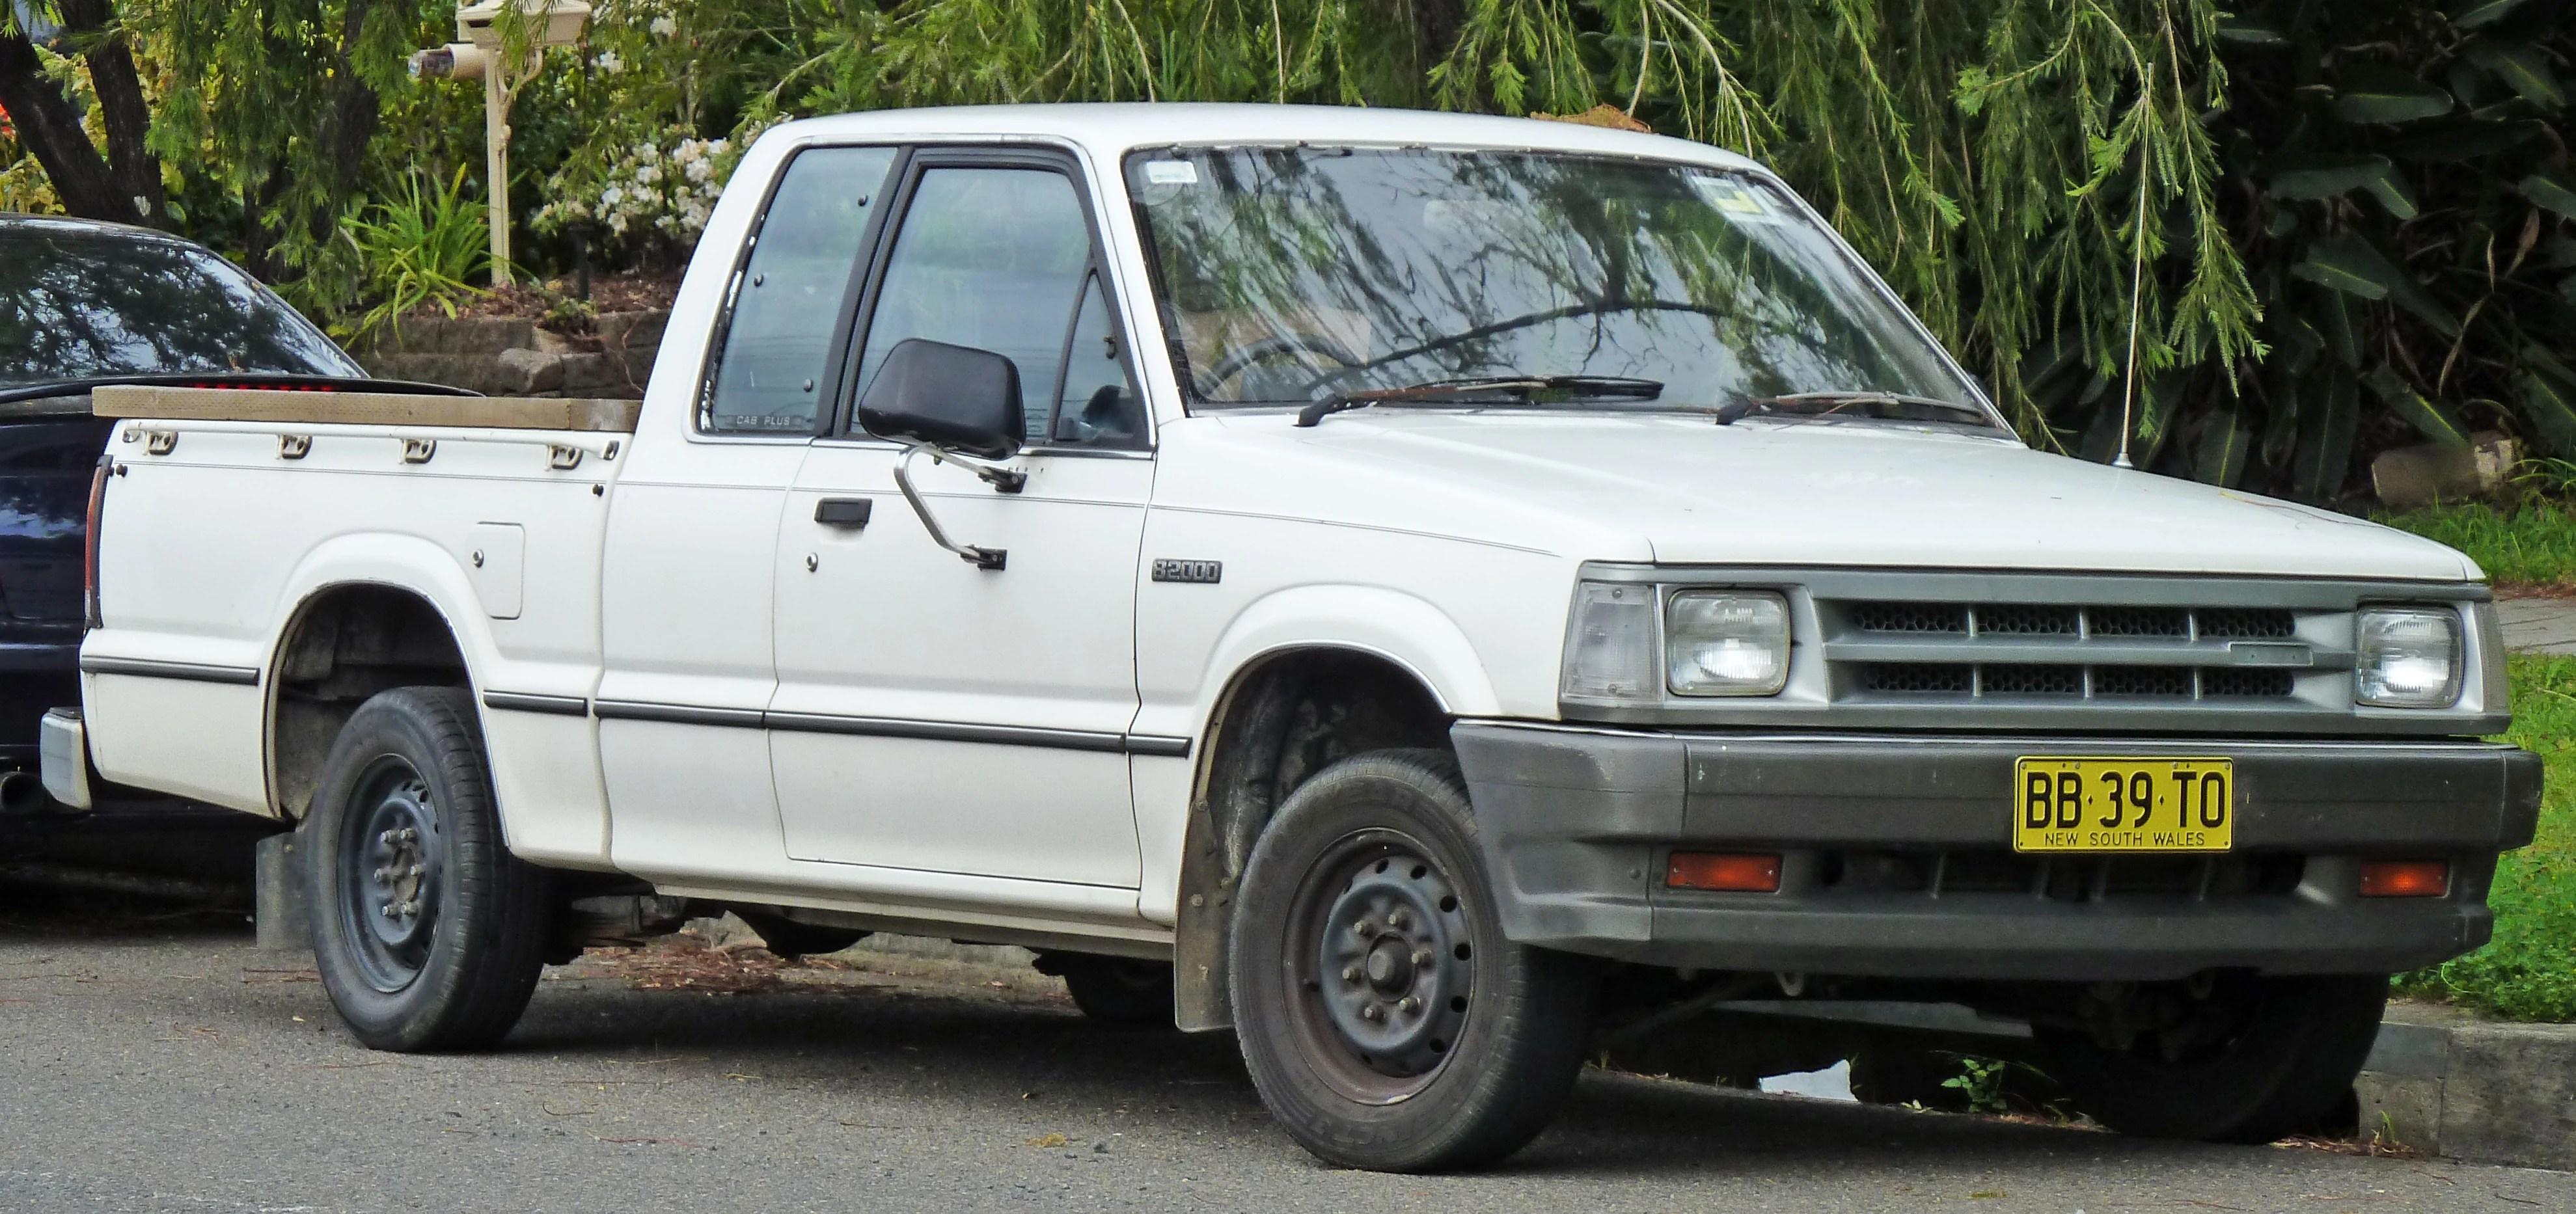 1985 1988 mazda b2000 cab plus 2 door utility 01 1985 1988 [ 3958 x 1866 Pixel ]